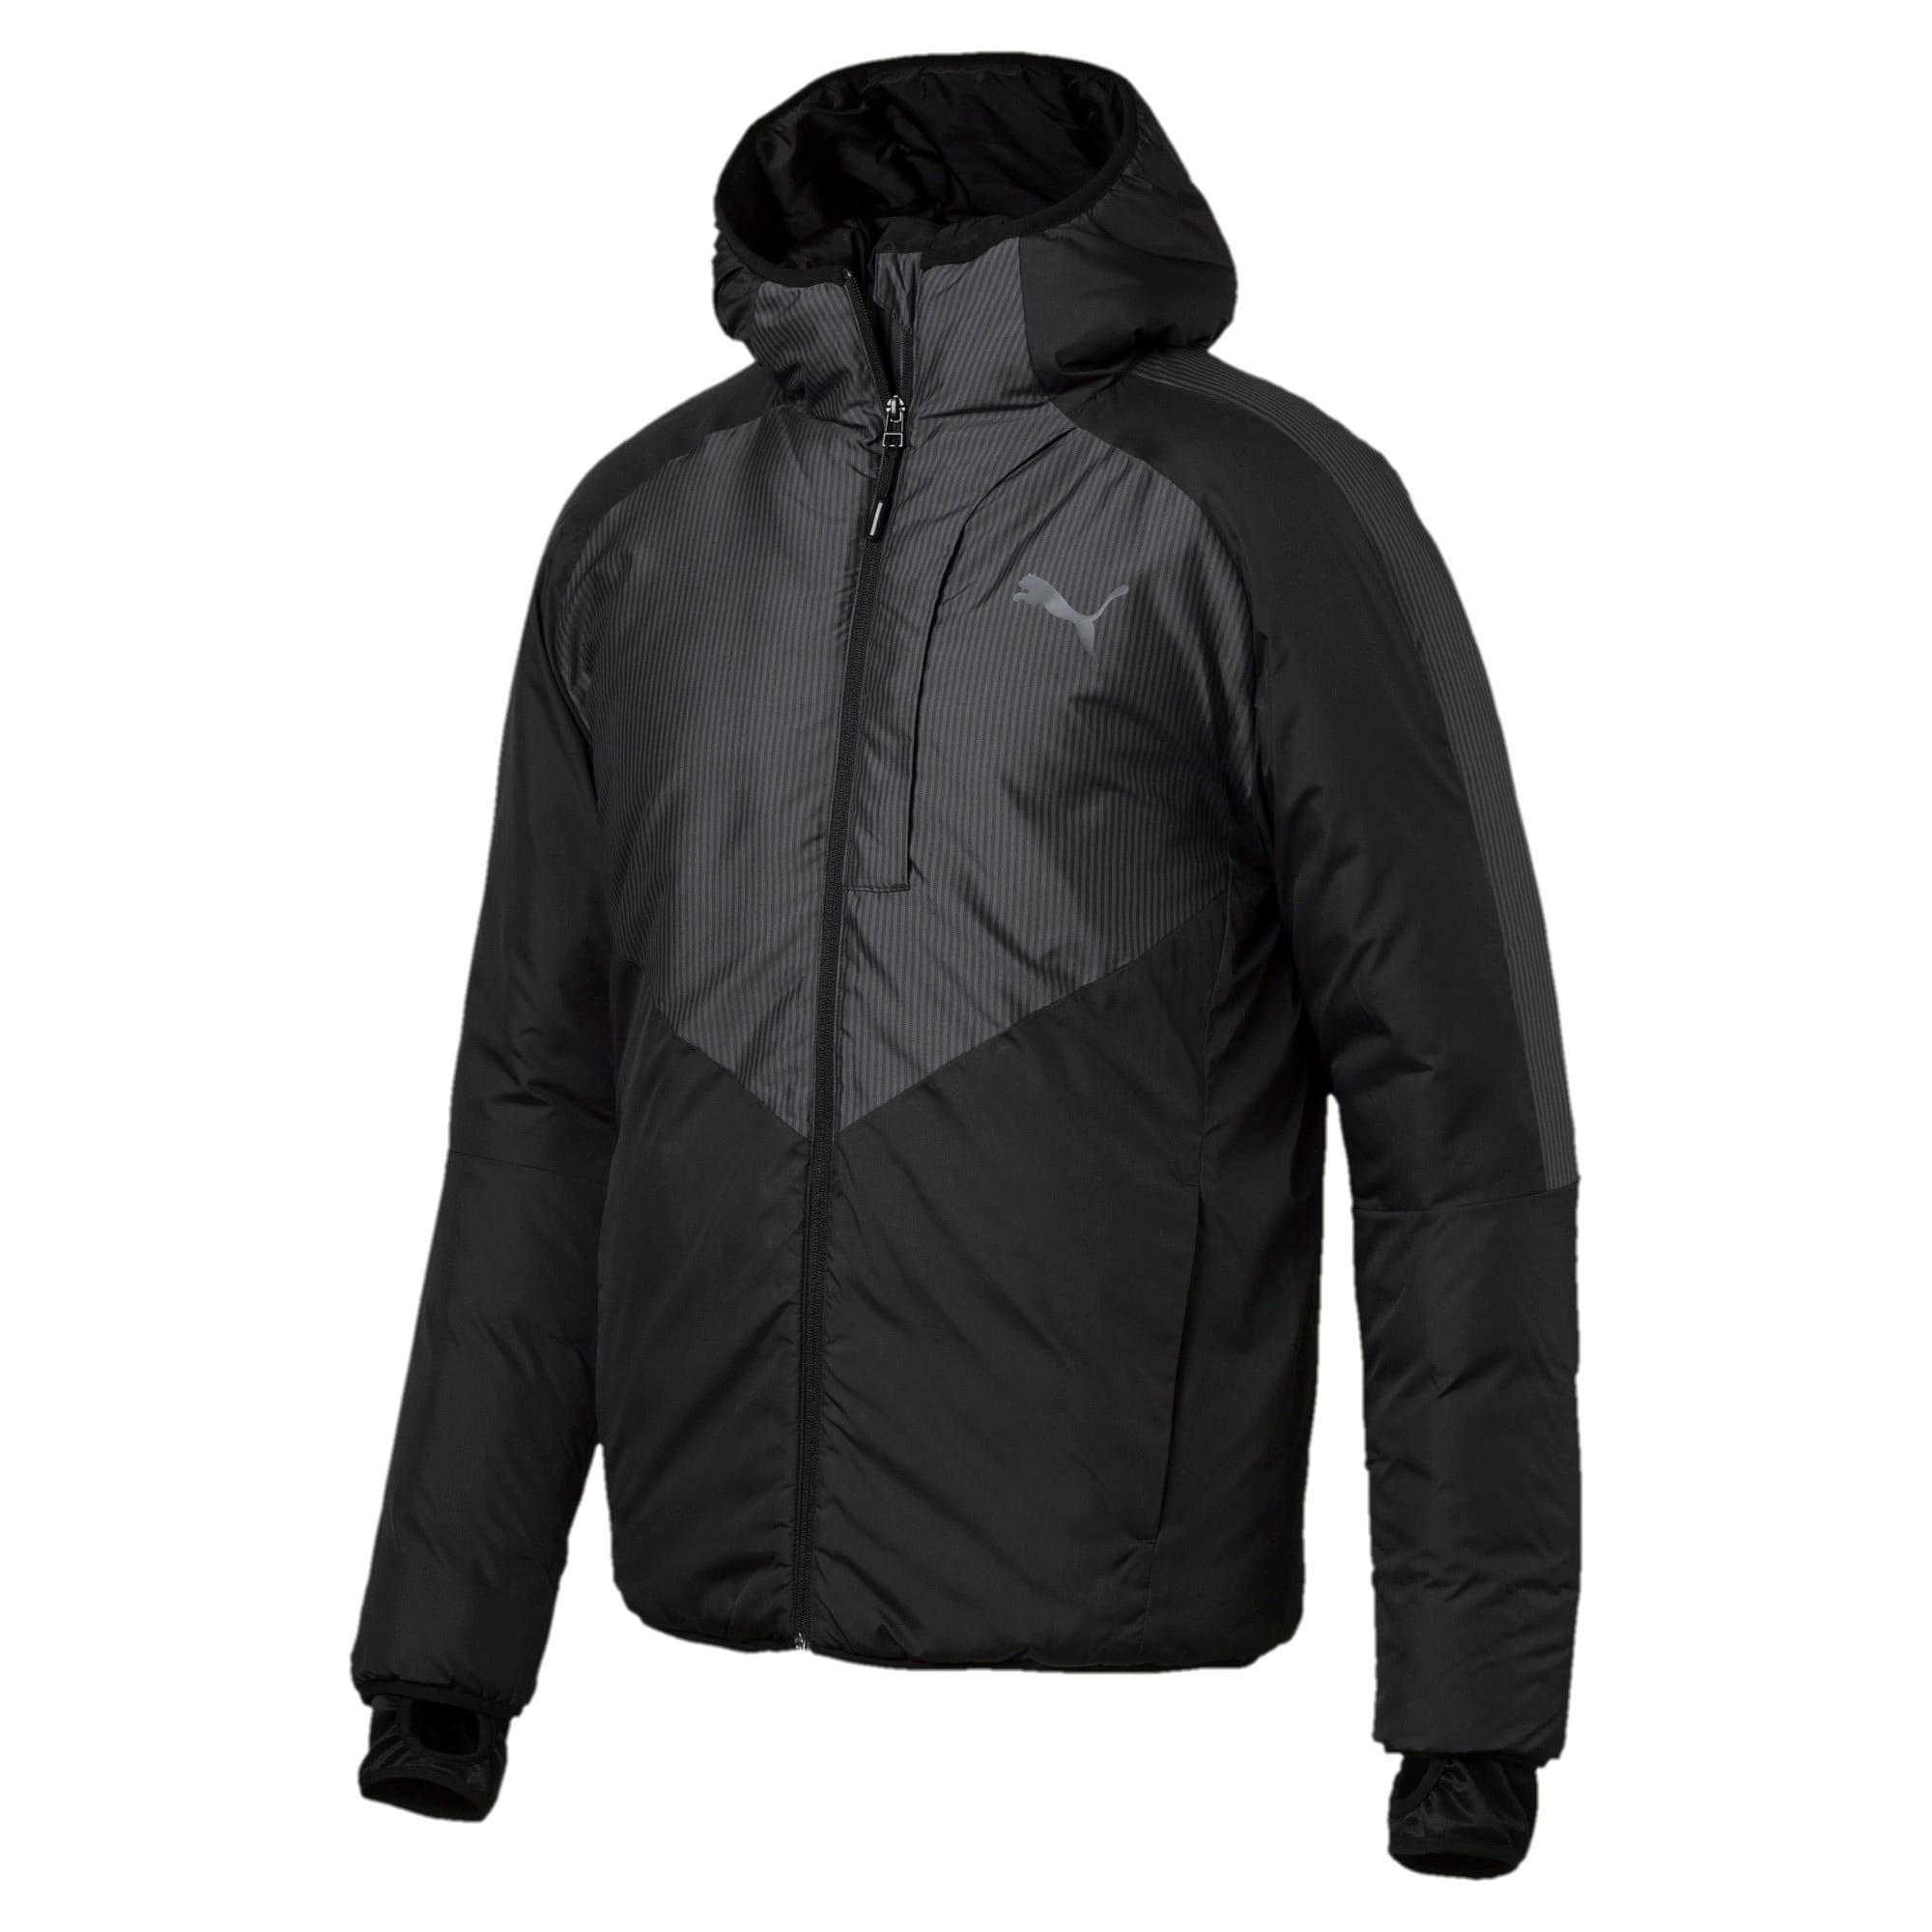 Thumbnail 1 of PWRWarm Men's Jacket, Puma Black, medium